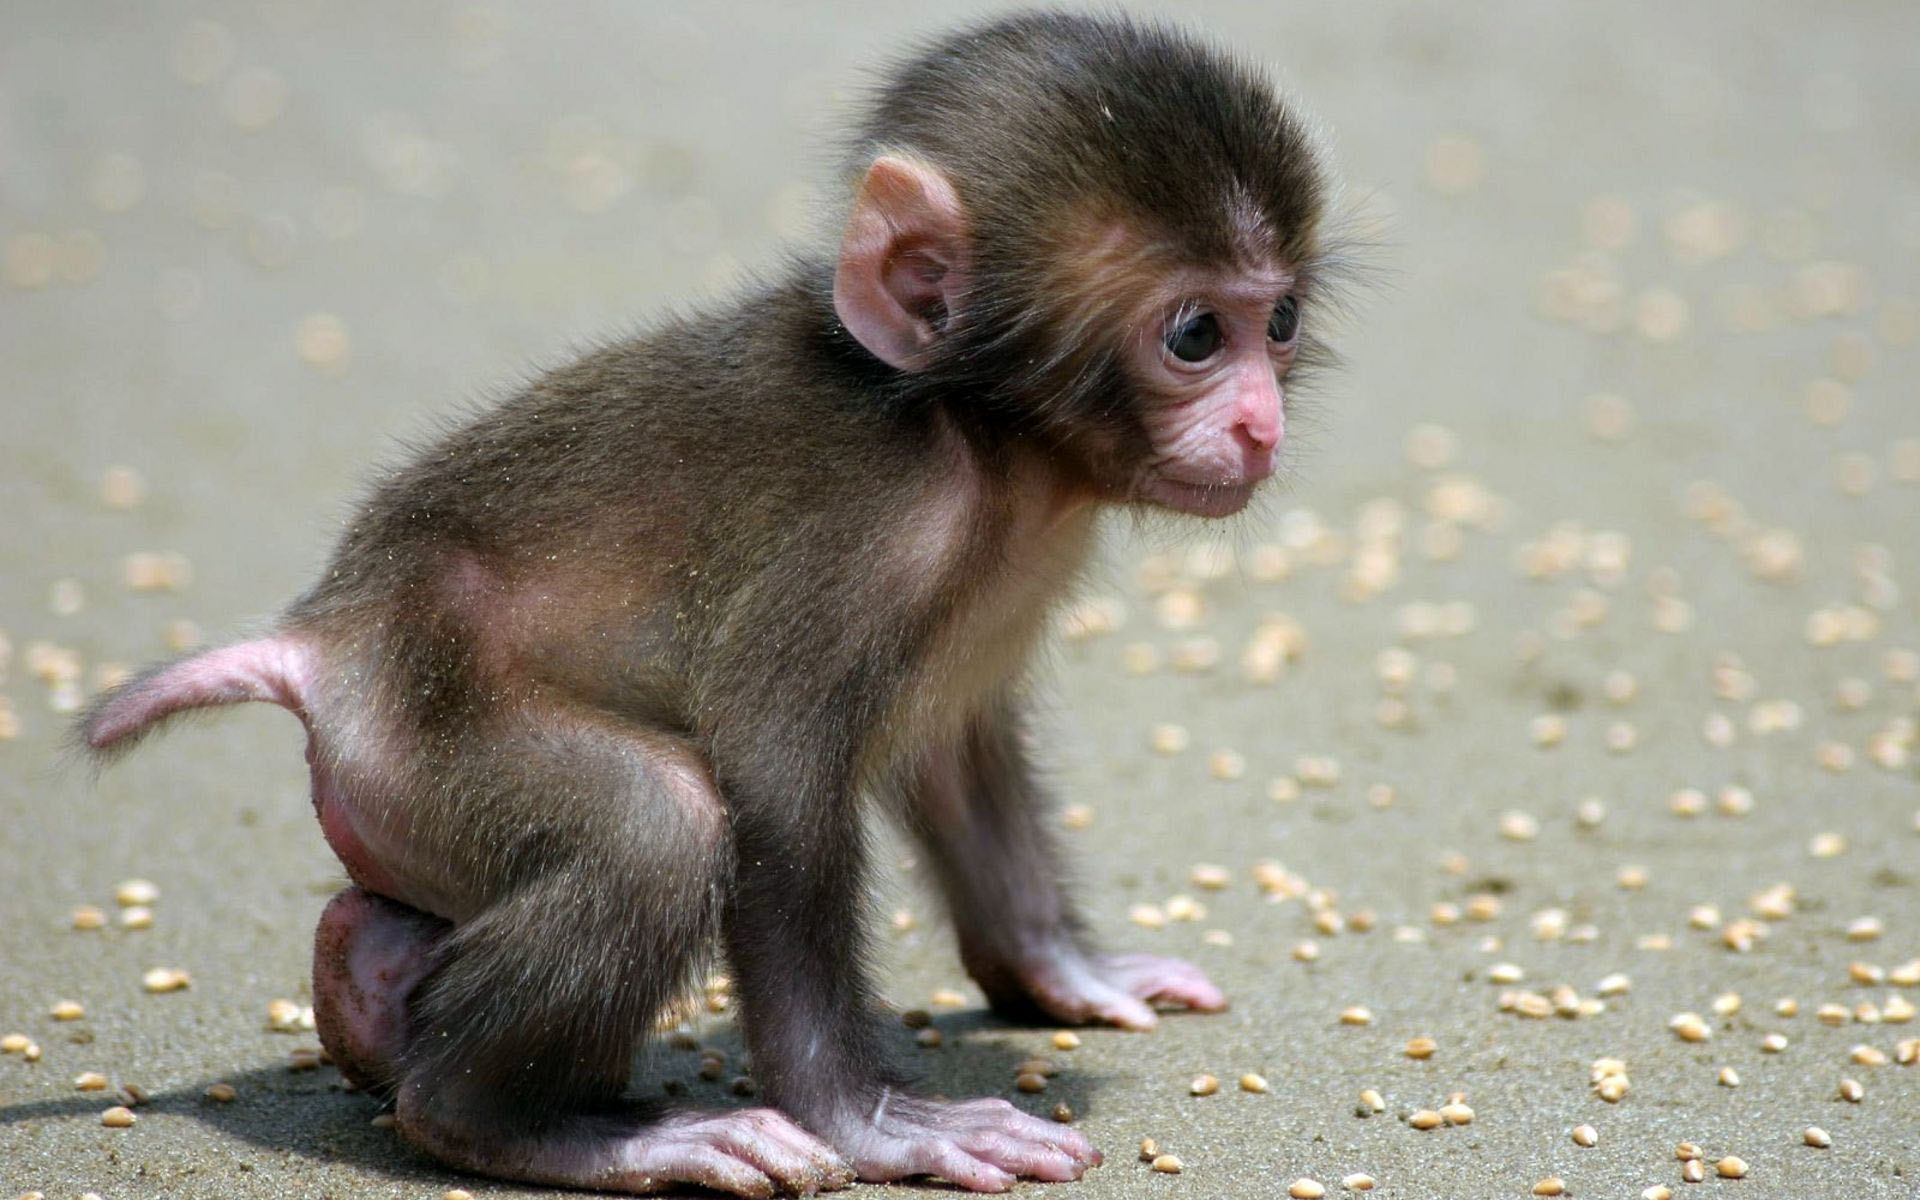 Baby Monkey beautiful hd wallpaper dwonload 1920x1200